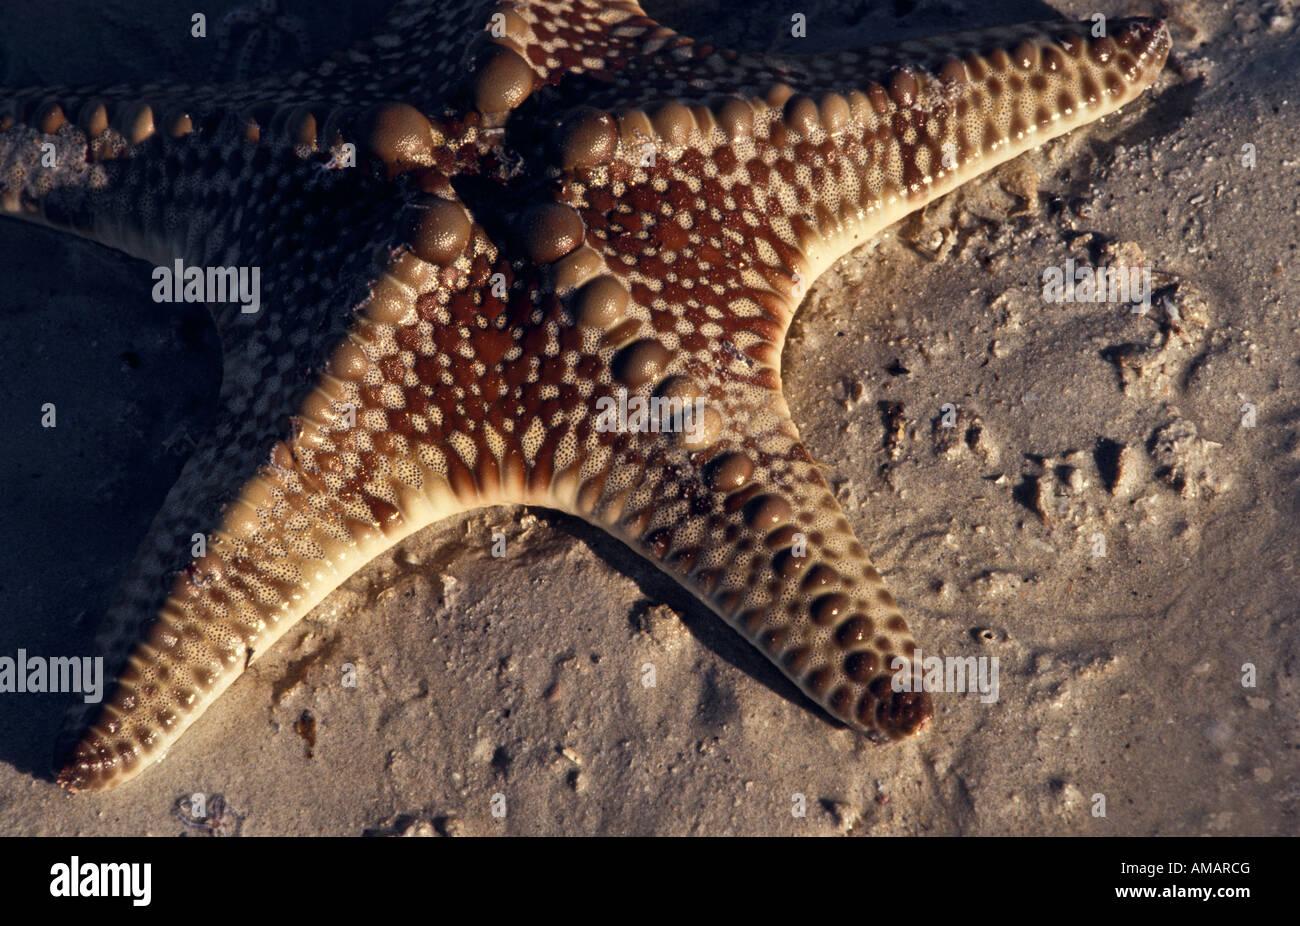 Starfish closeup, Australia - Stock Image